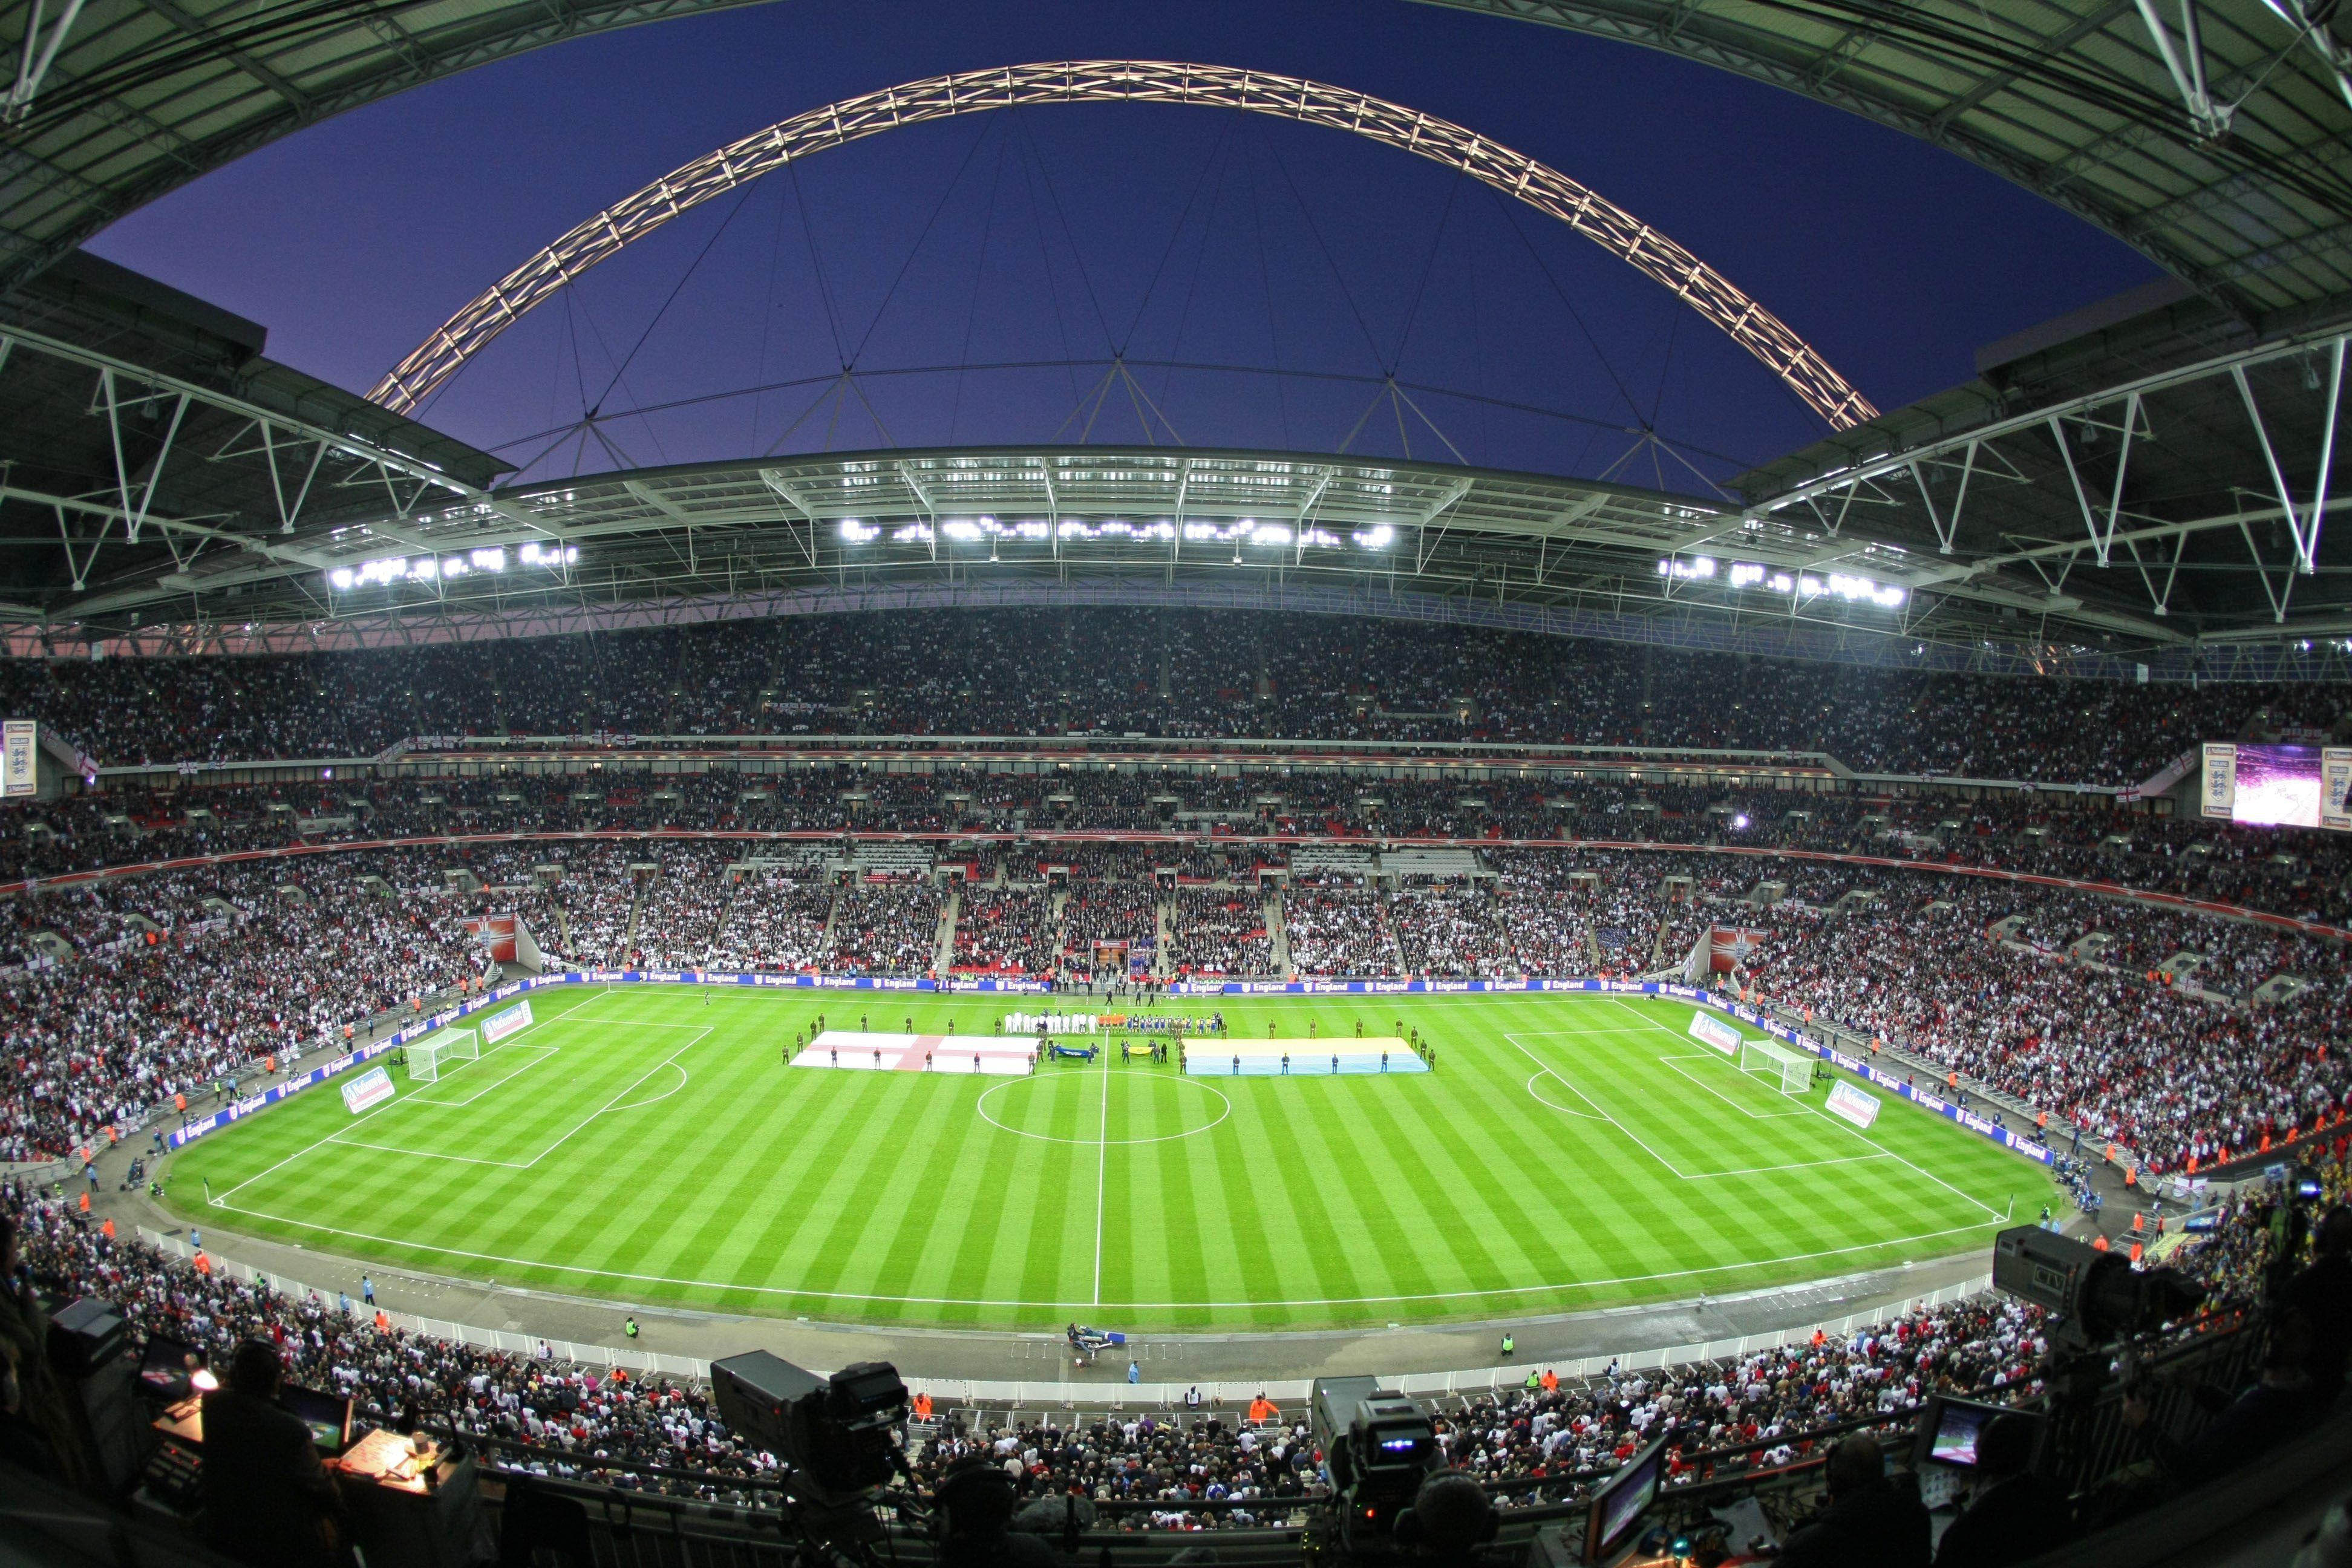 Soccer Stadium Wallpaper For Mac 1c8 Wembley Stadium Wallpaper Soccer Stadium